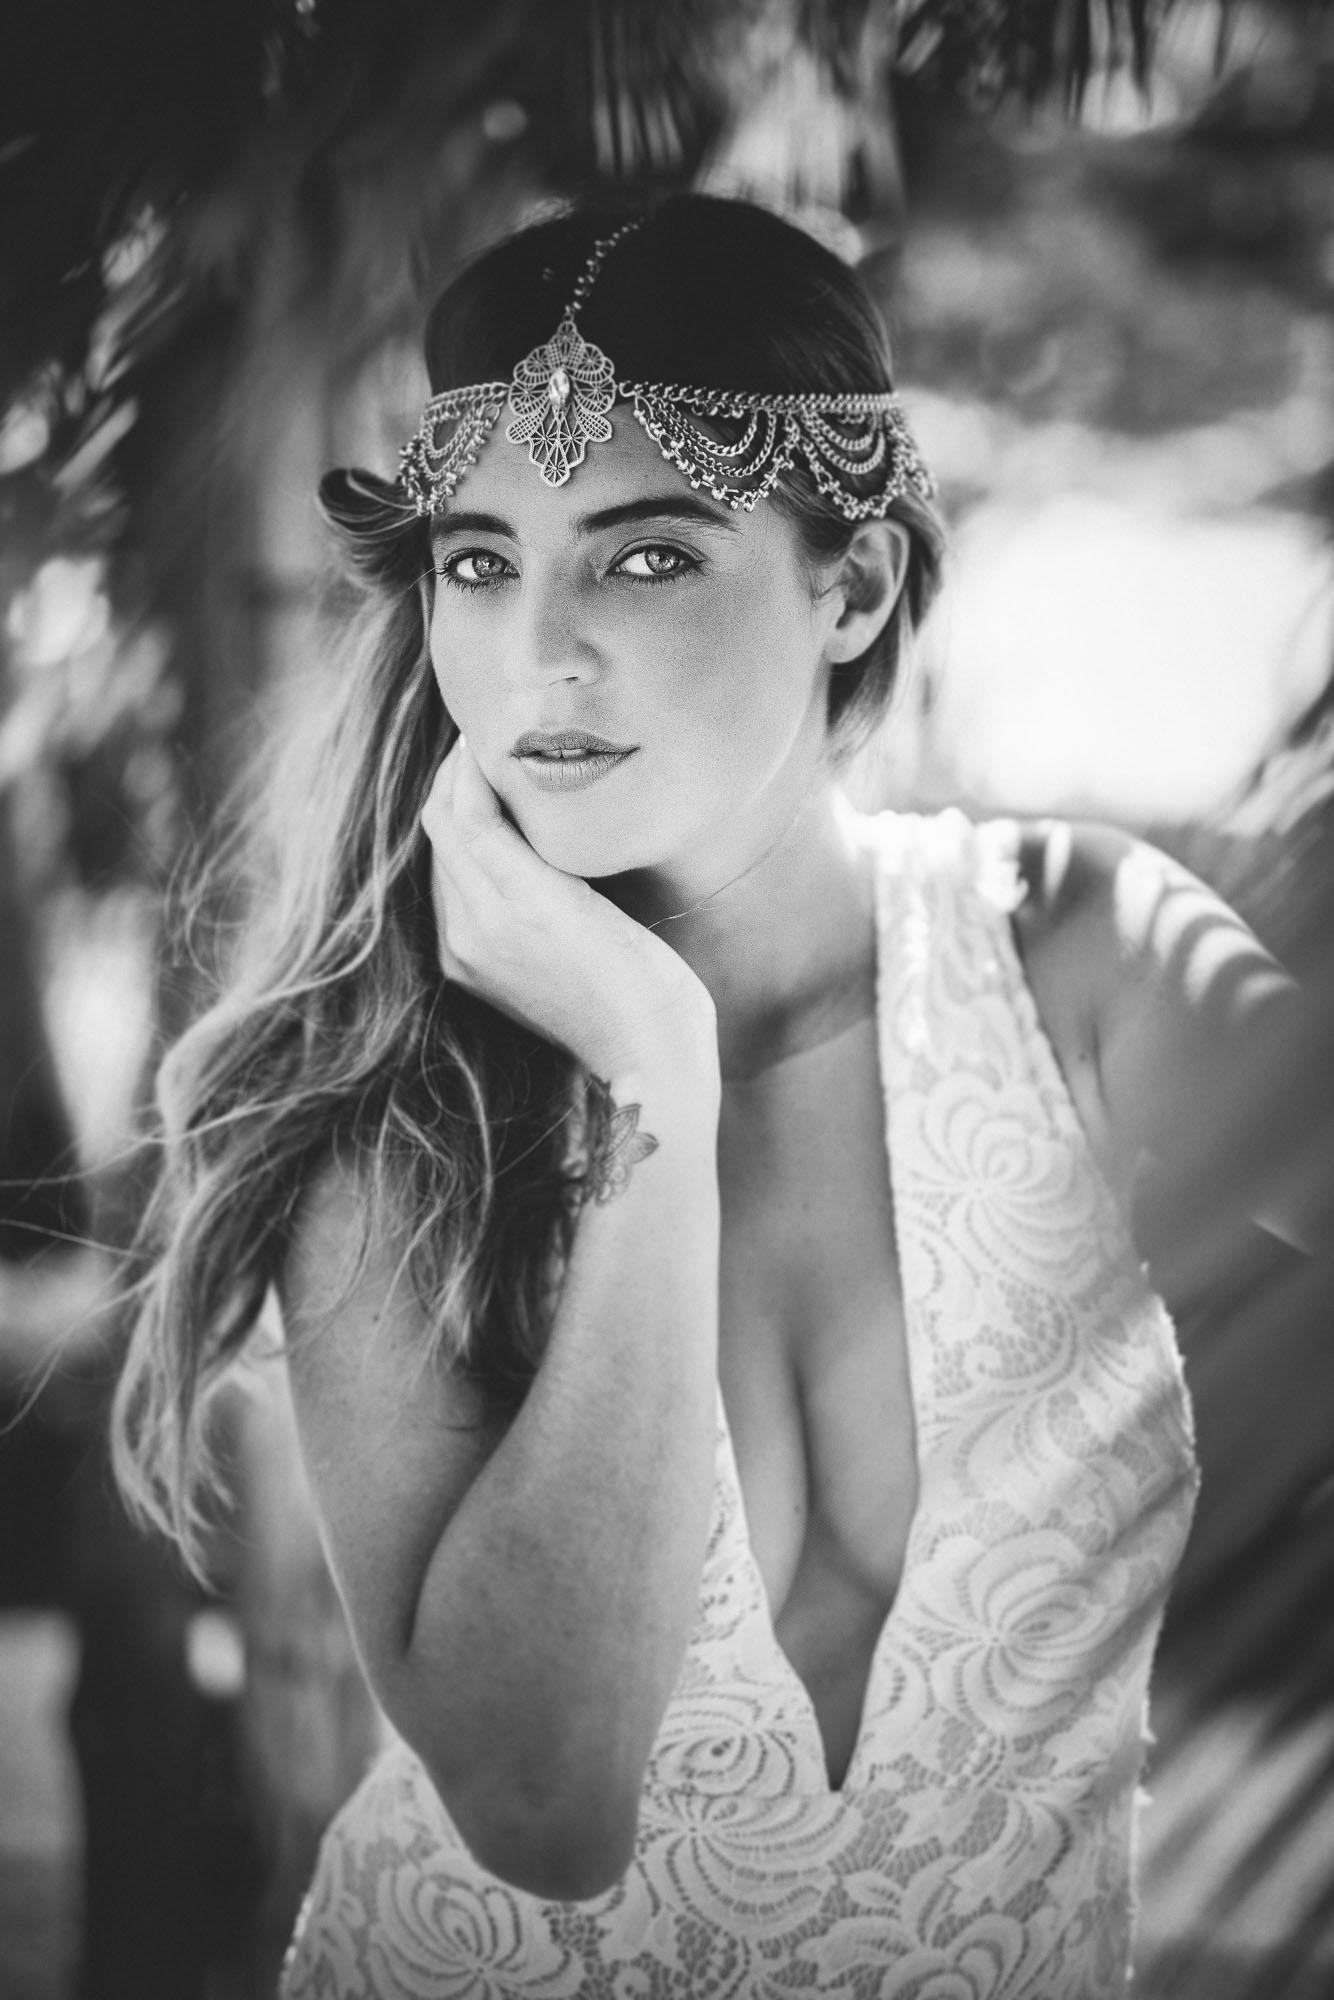 model posing under driftwood arch wearing Frankly My Dear headpiece